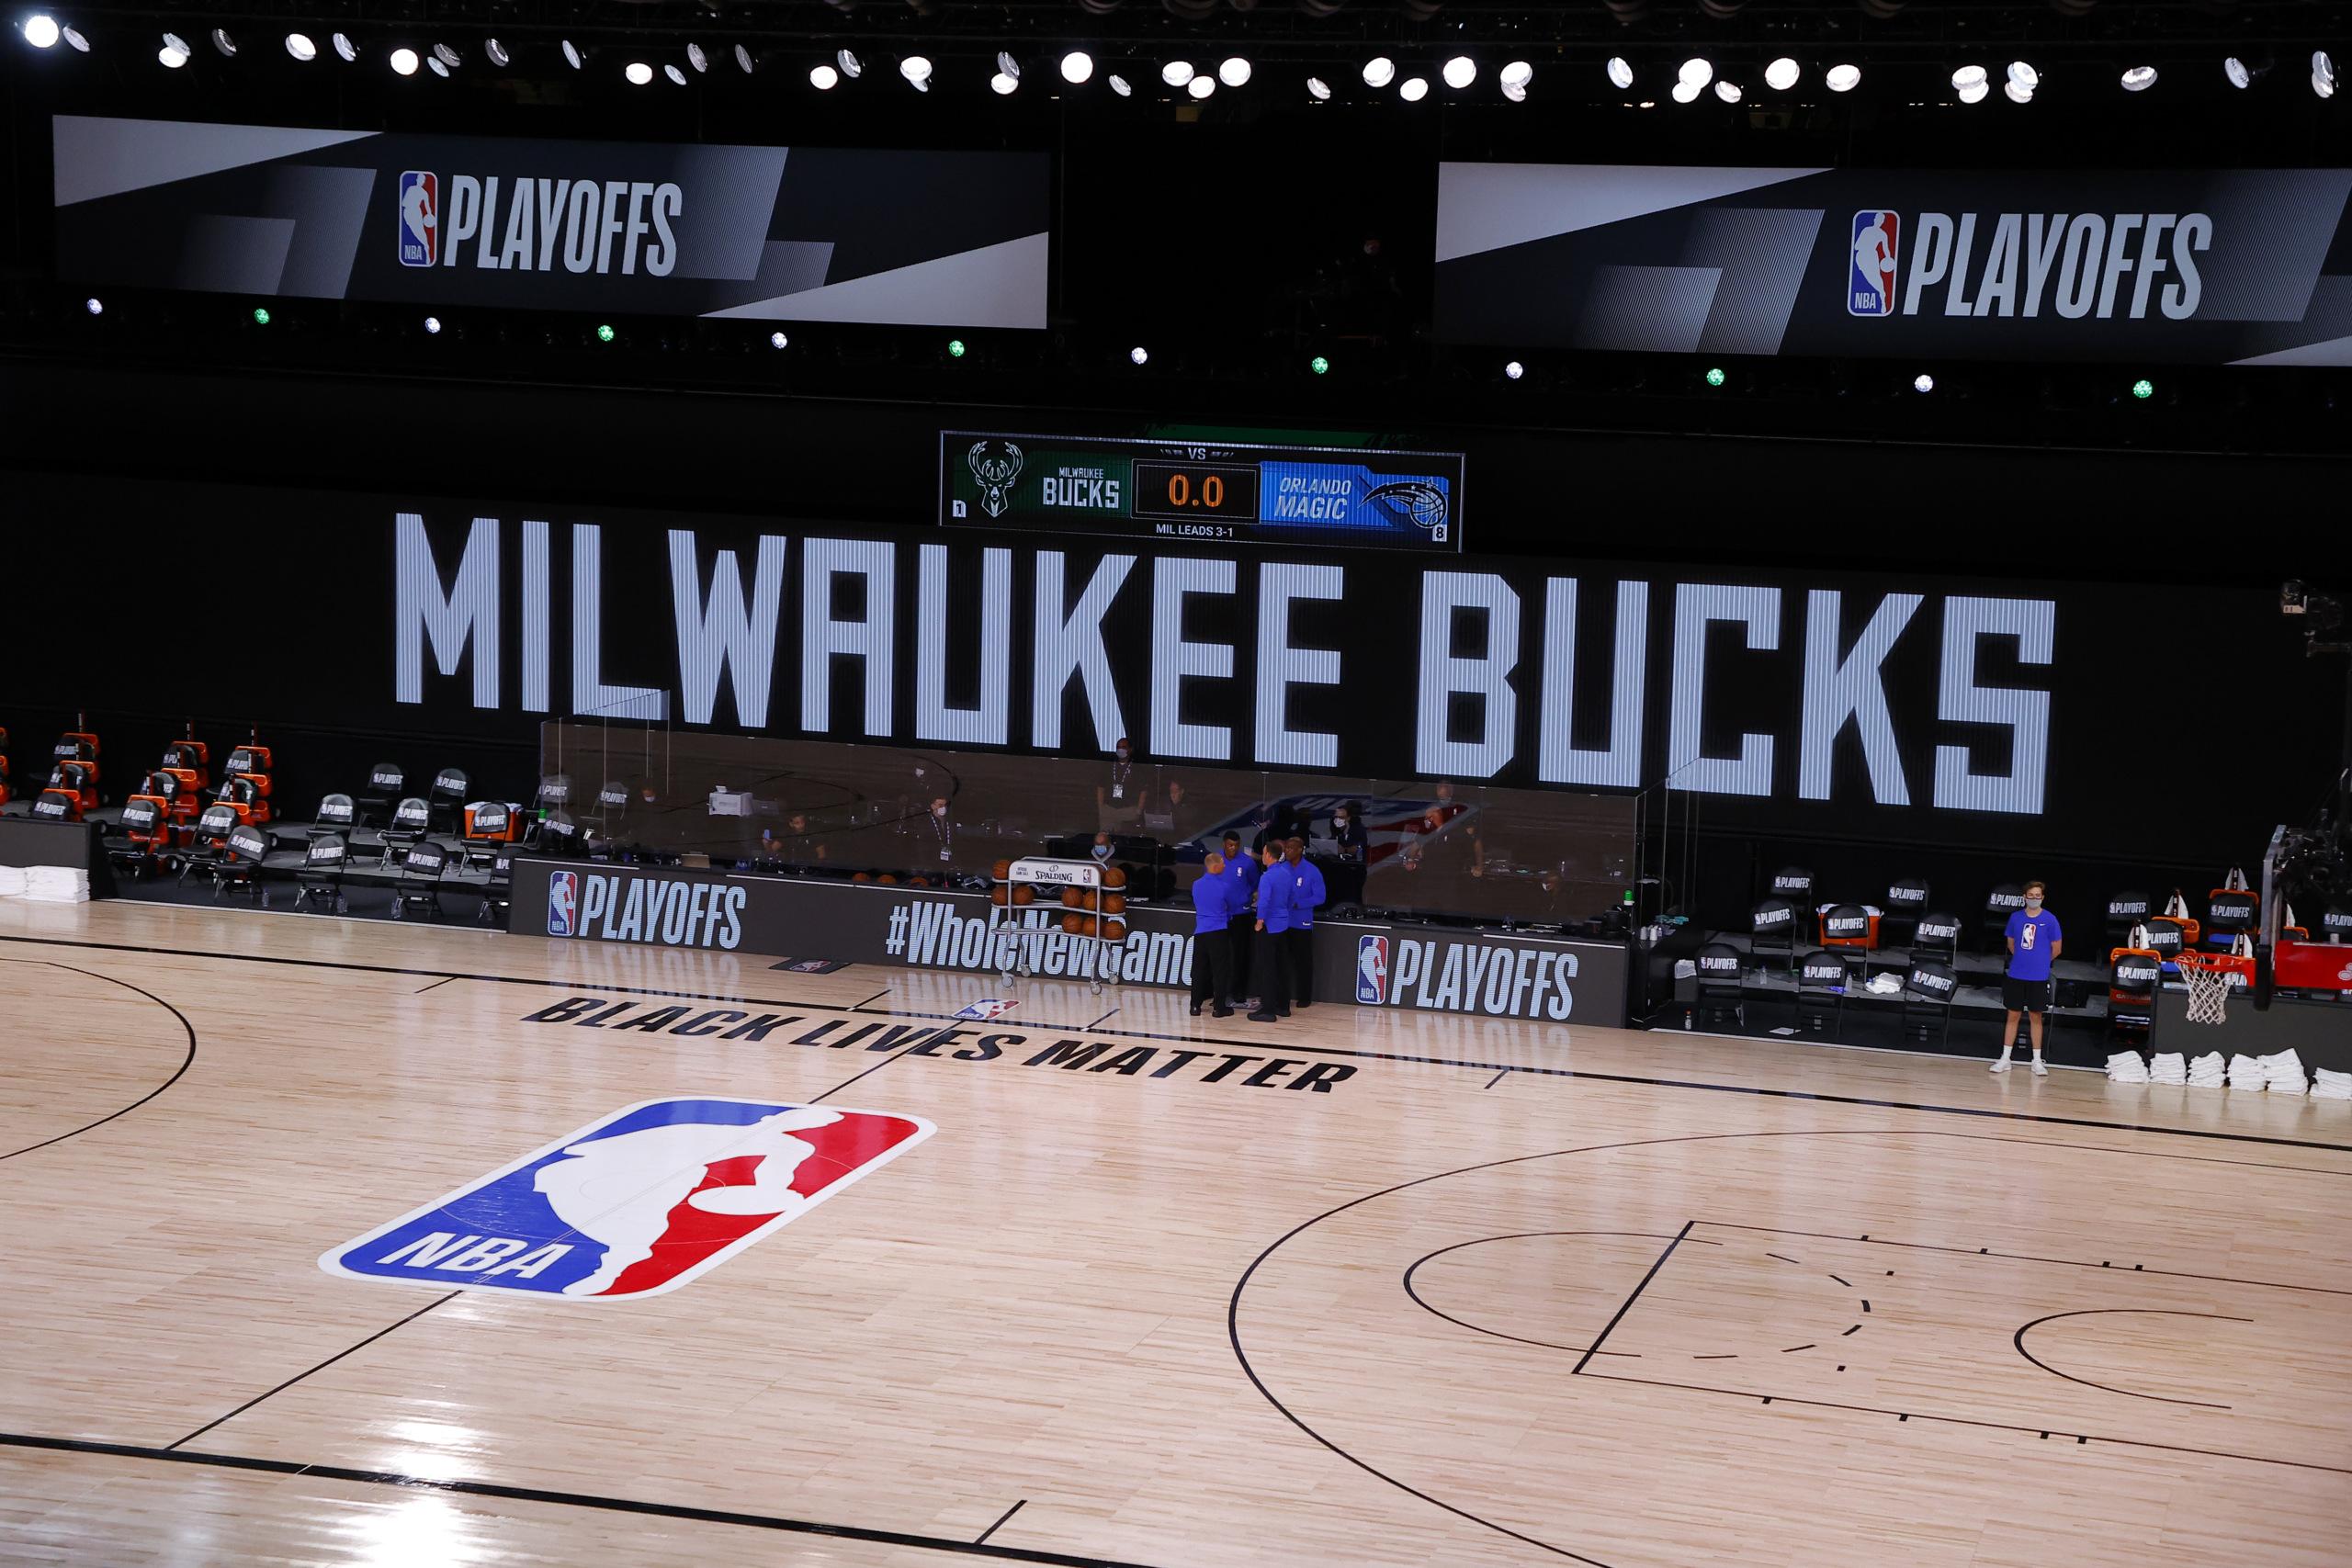 Sparked by Bucks' Strike, Slate of NBA Playoff Games Postponed